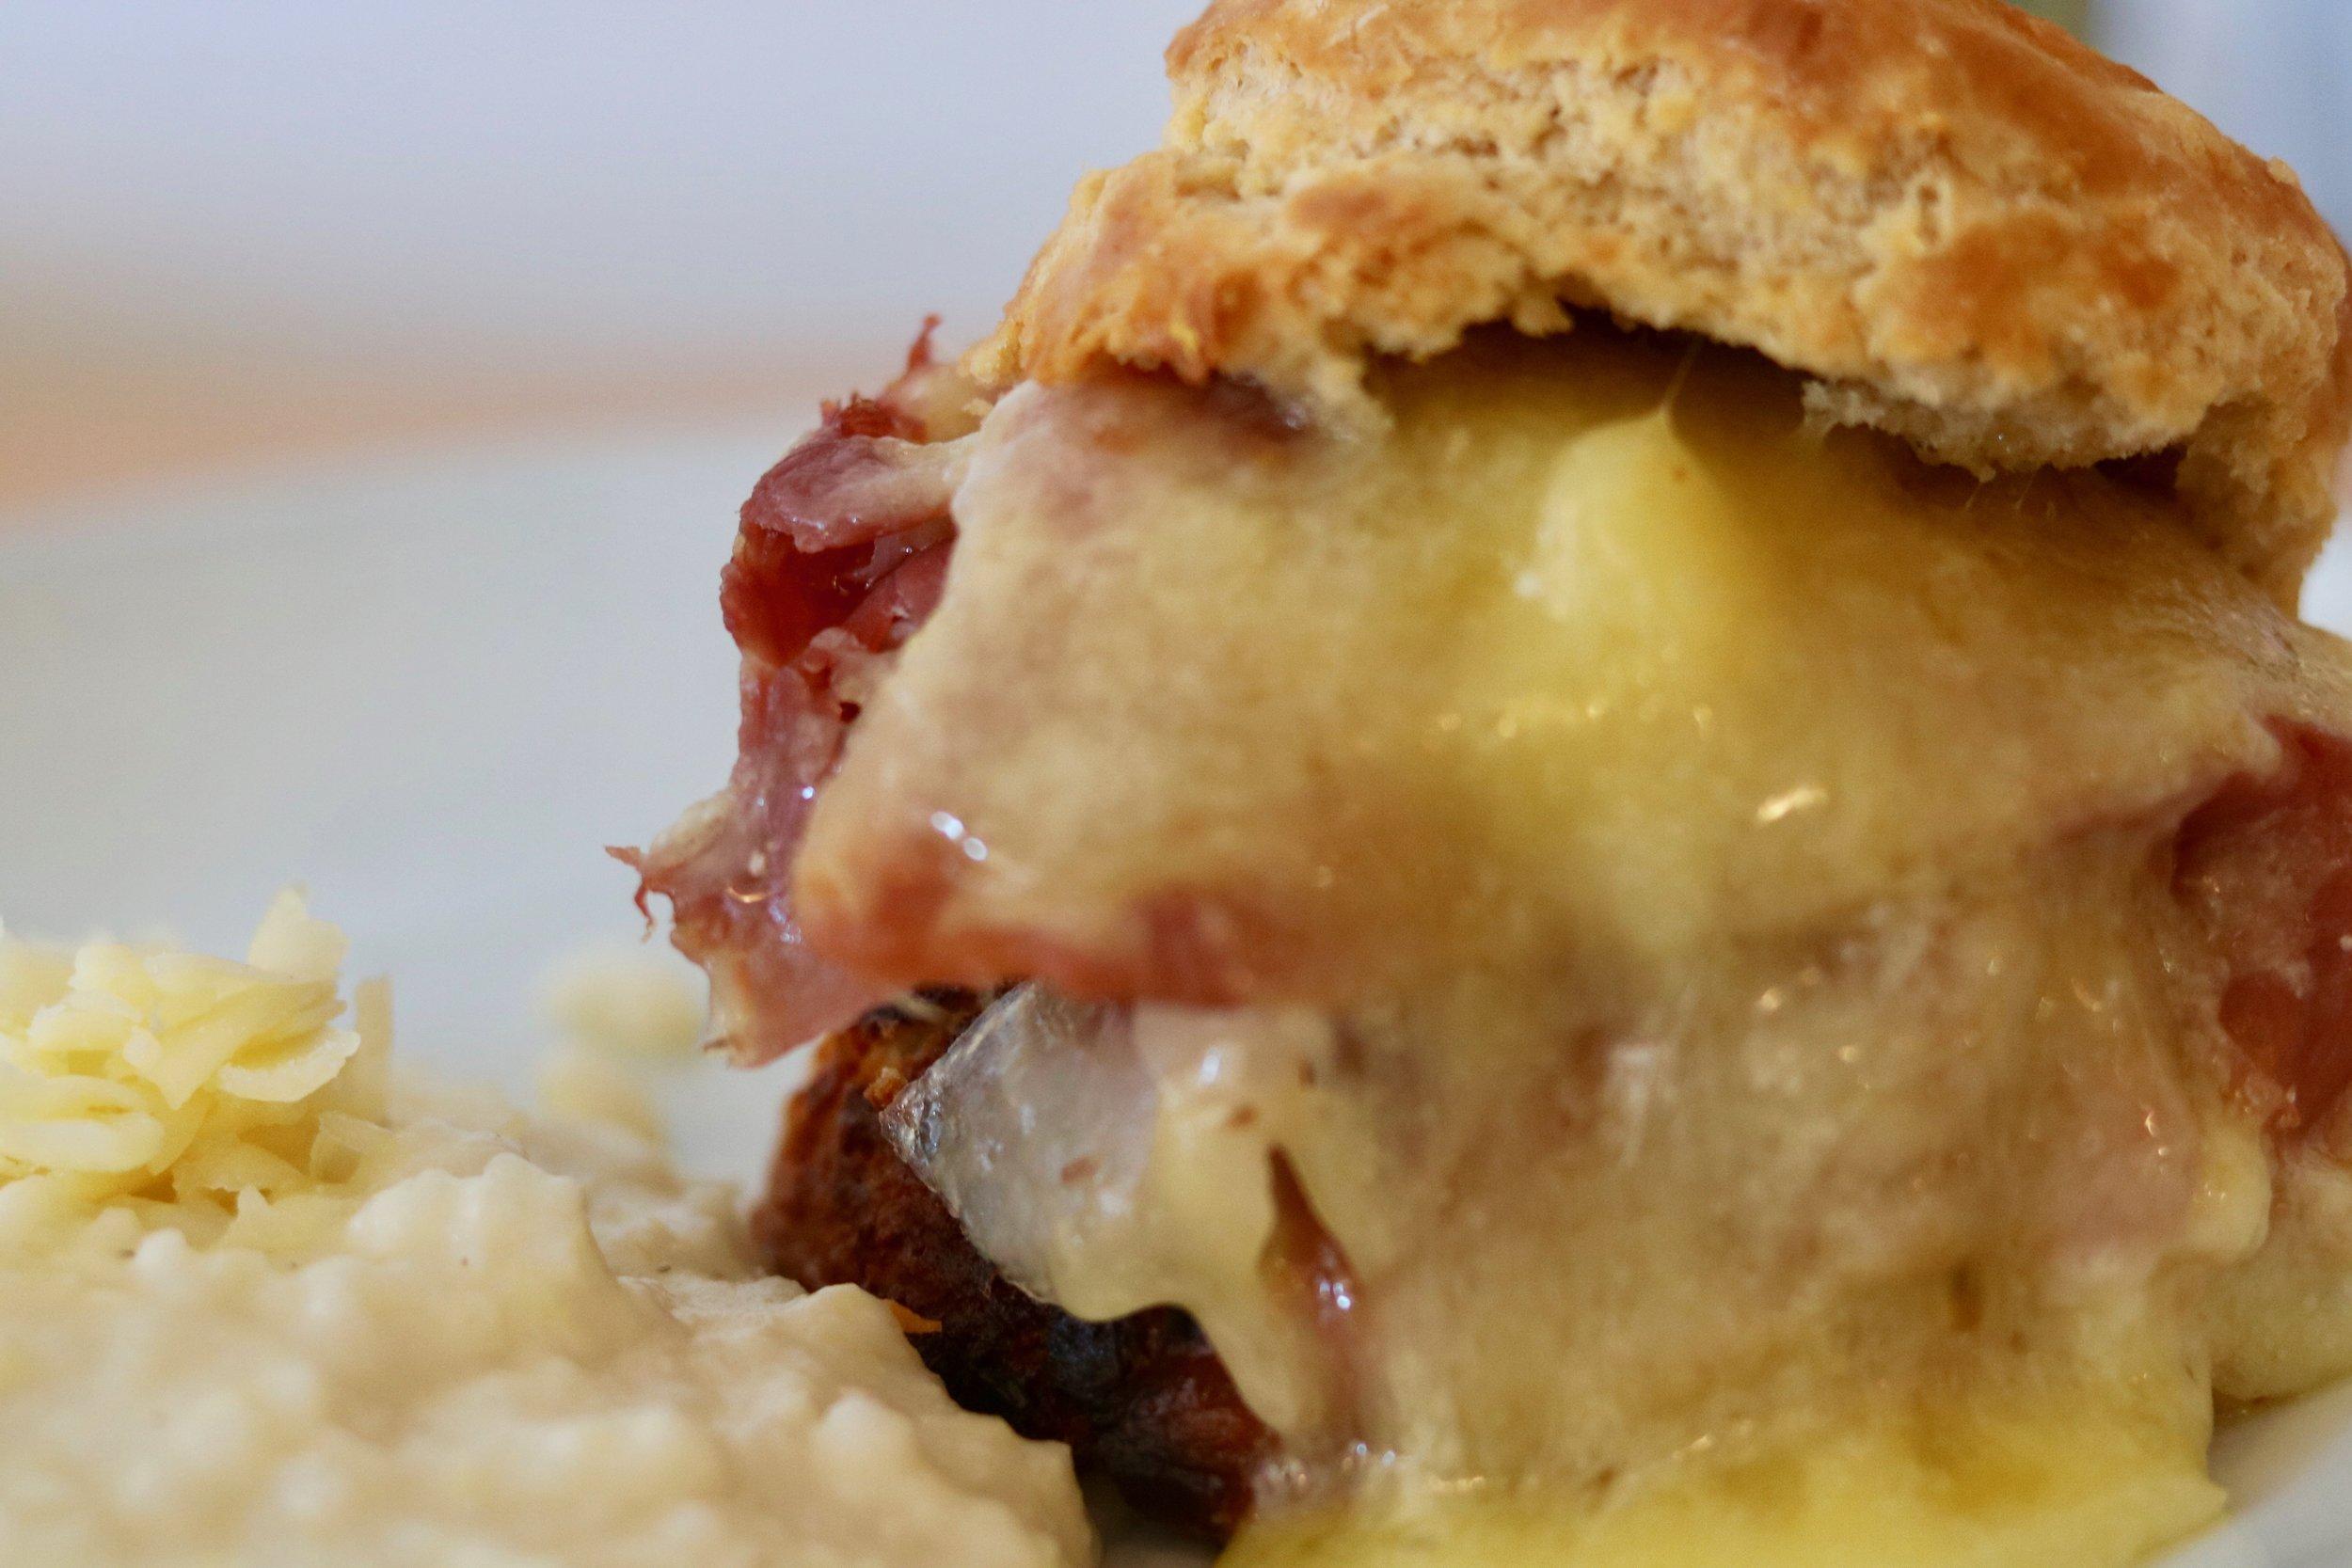 Egg Restaurant's Country Ham Biscuit